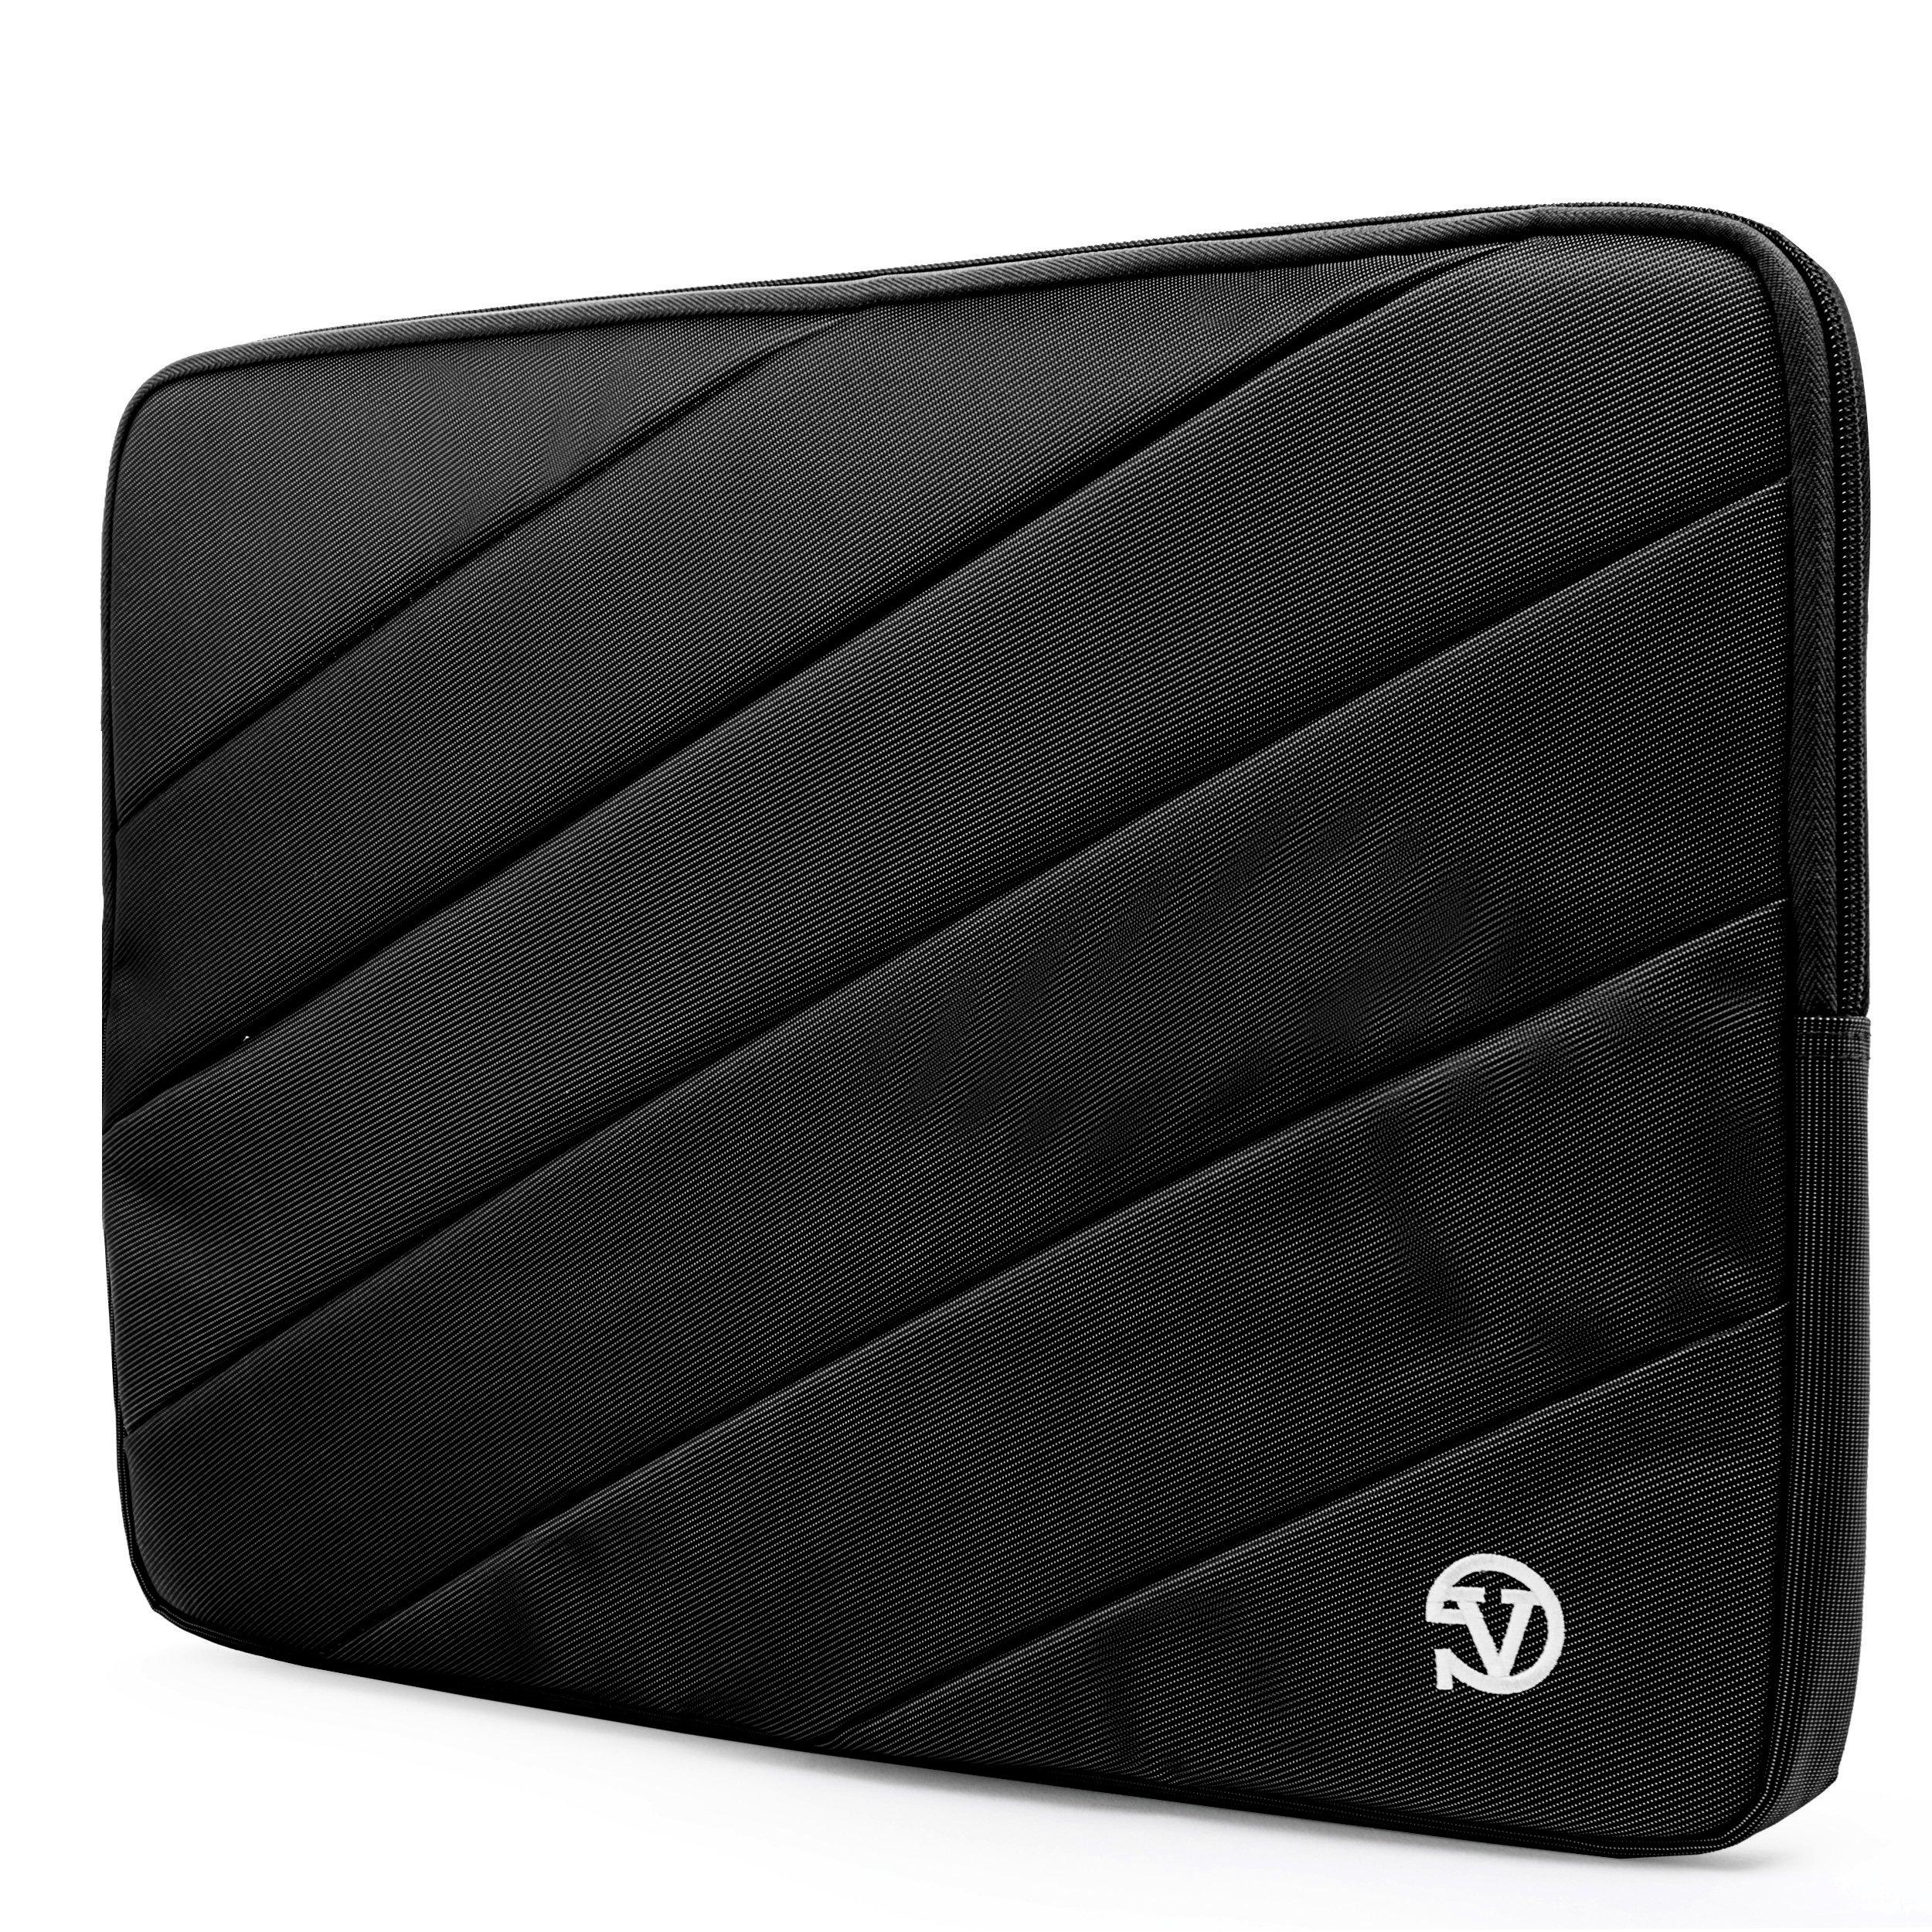 Vangoddy Onyx Black Shock Absorbent Sleeve Fit for Lenovo Flex/IdeaPad / ThinkPad/Legion / Yoga 14''-15.6inch